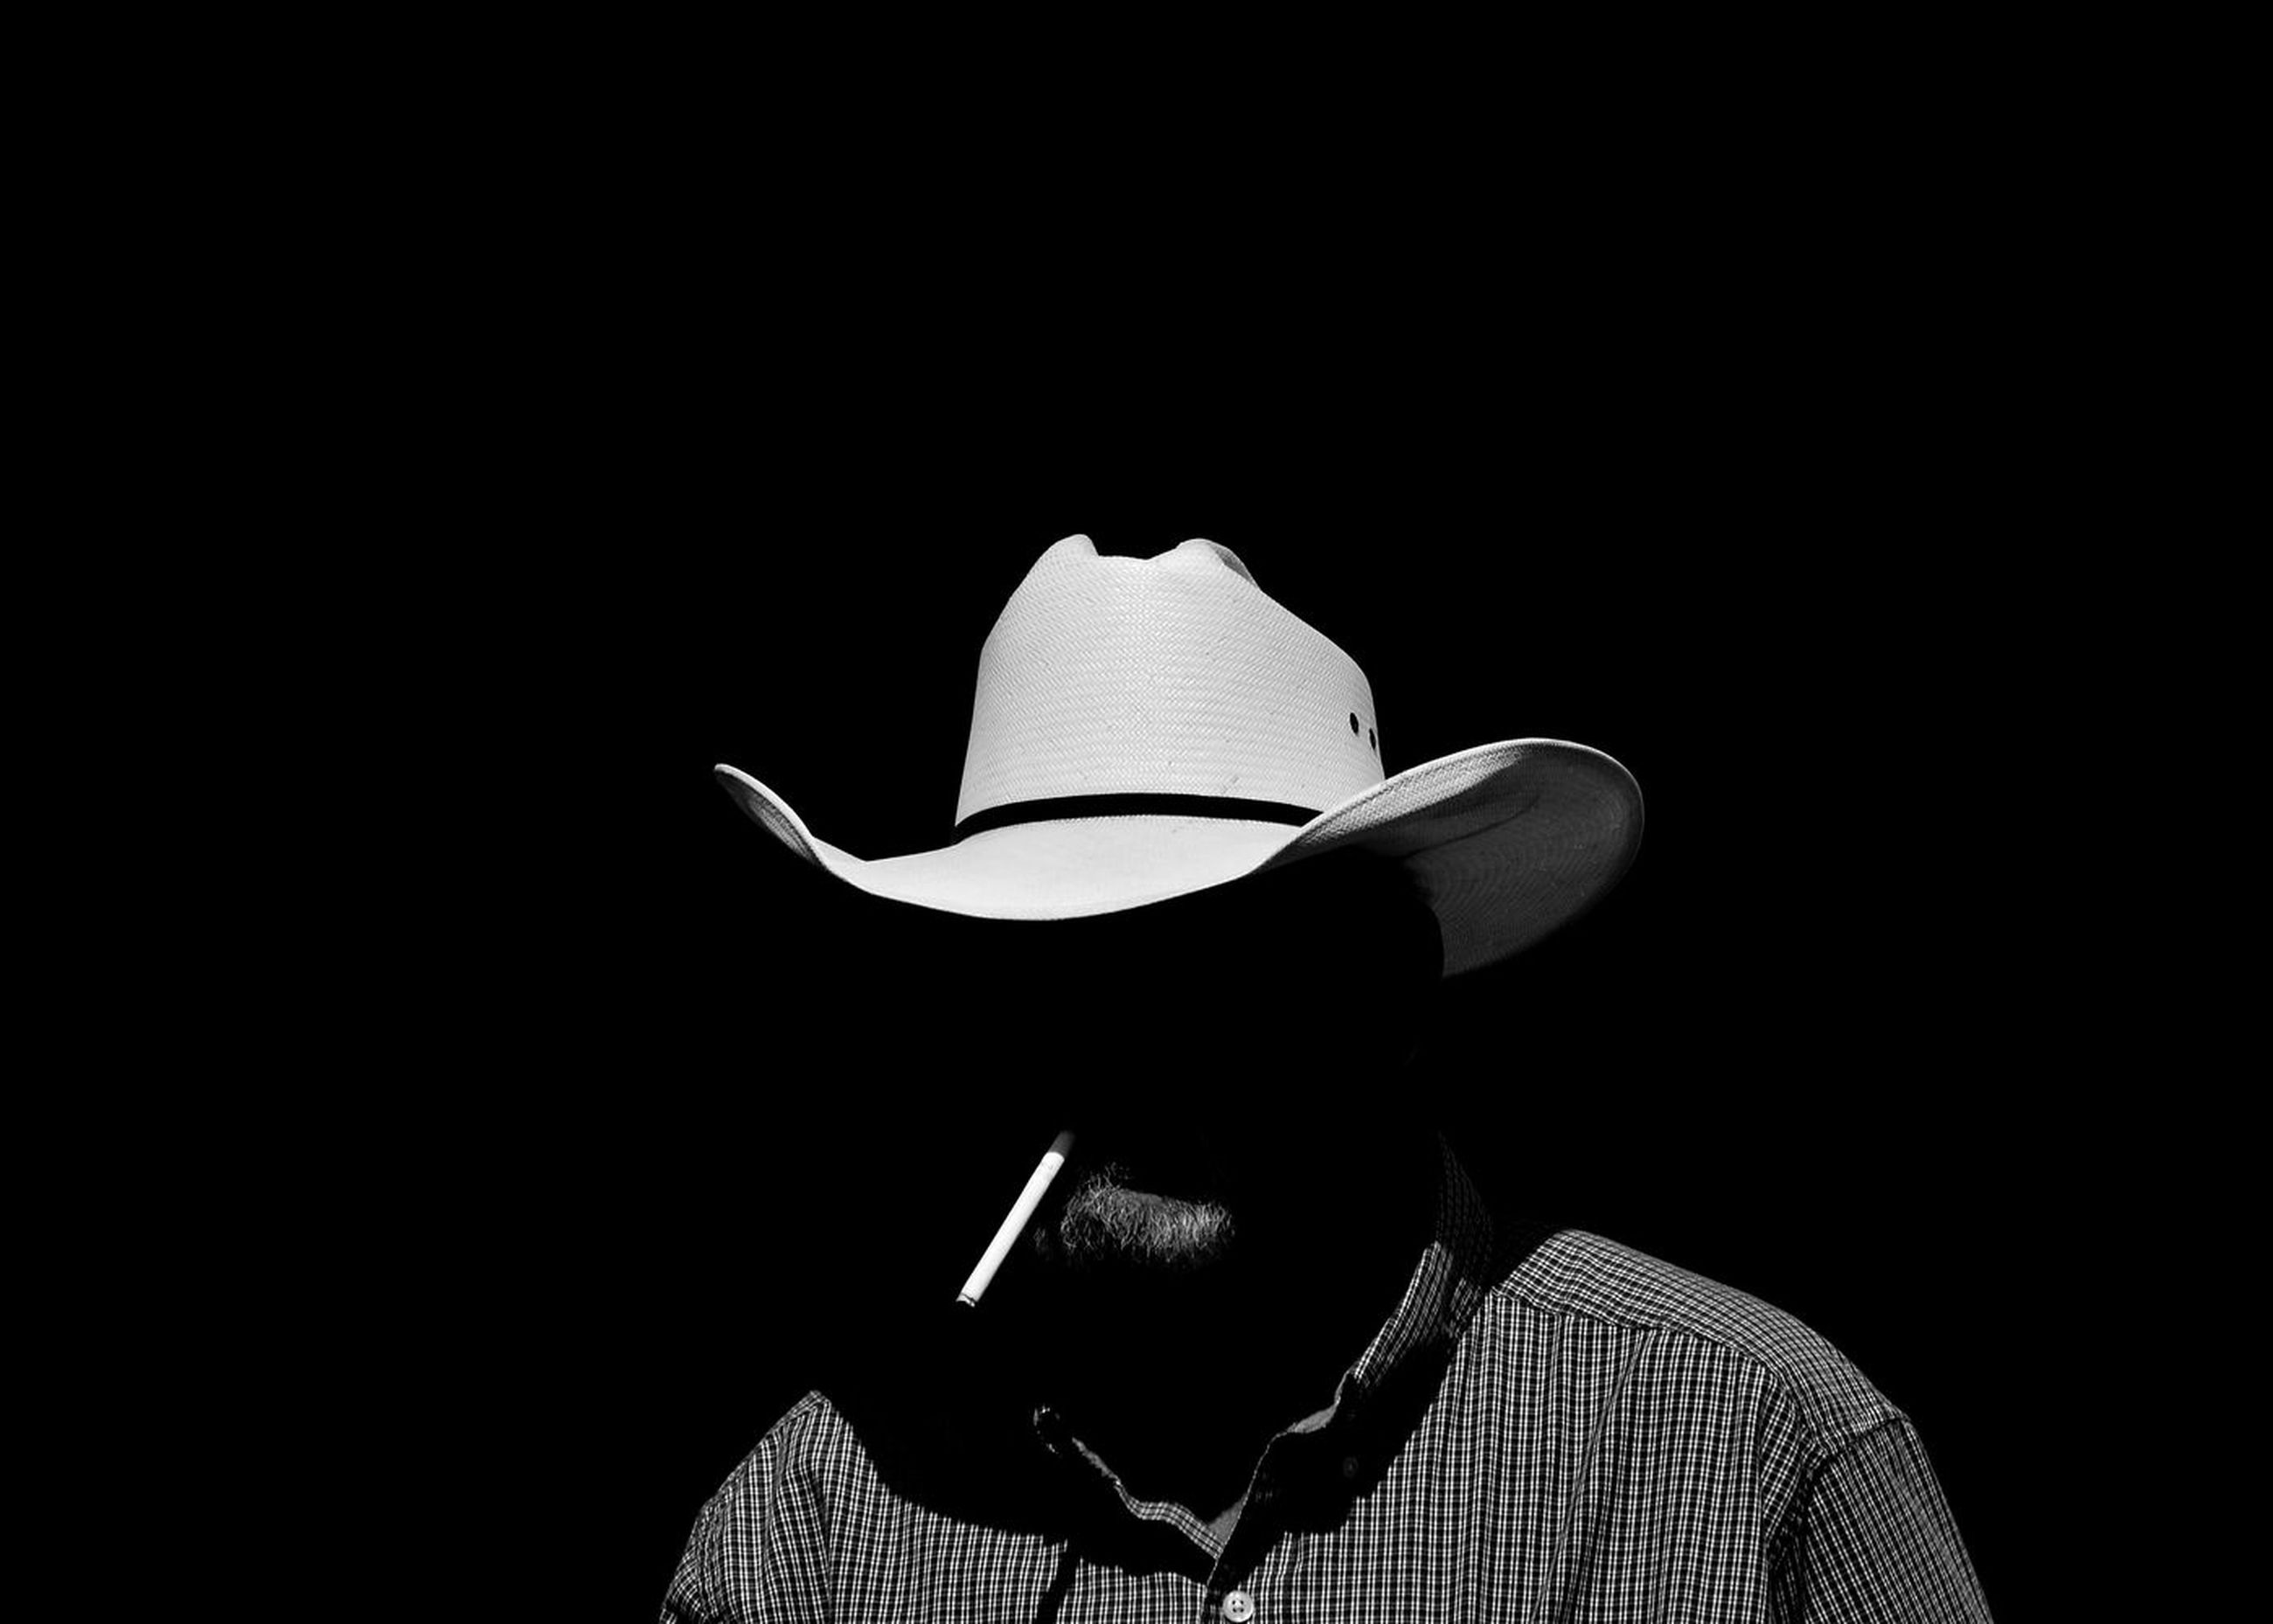 hat, black background, studio shot, men, cowboy hat, headshot, real people, lifestyles, one person, headwear, day, people